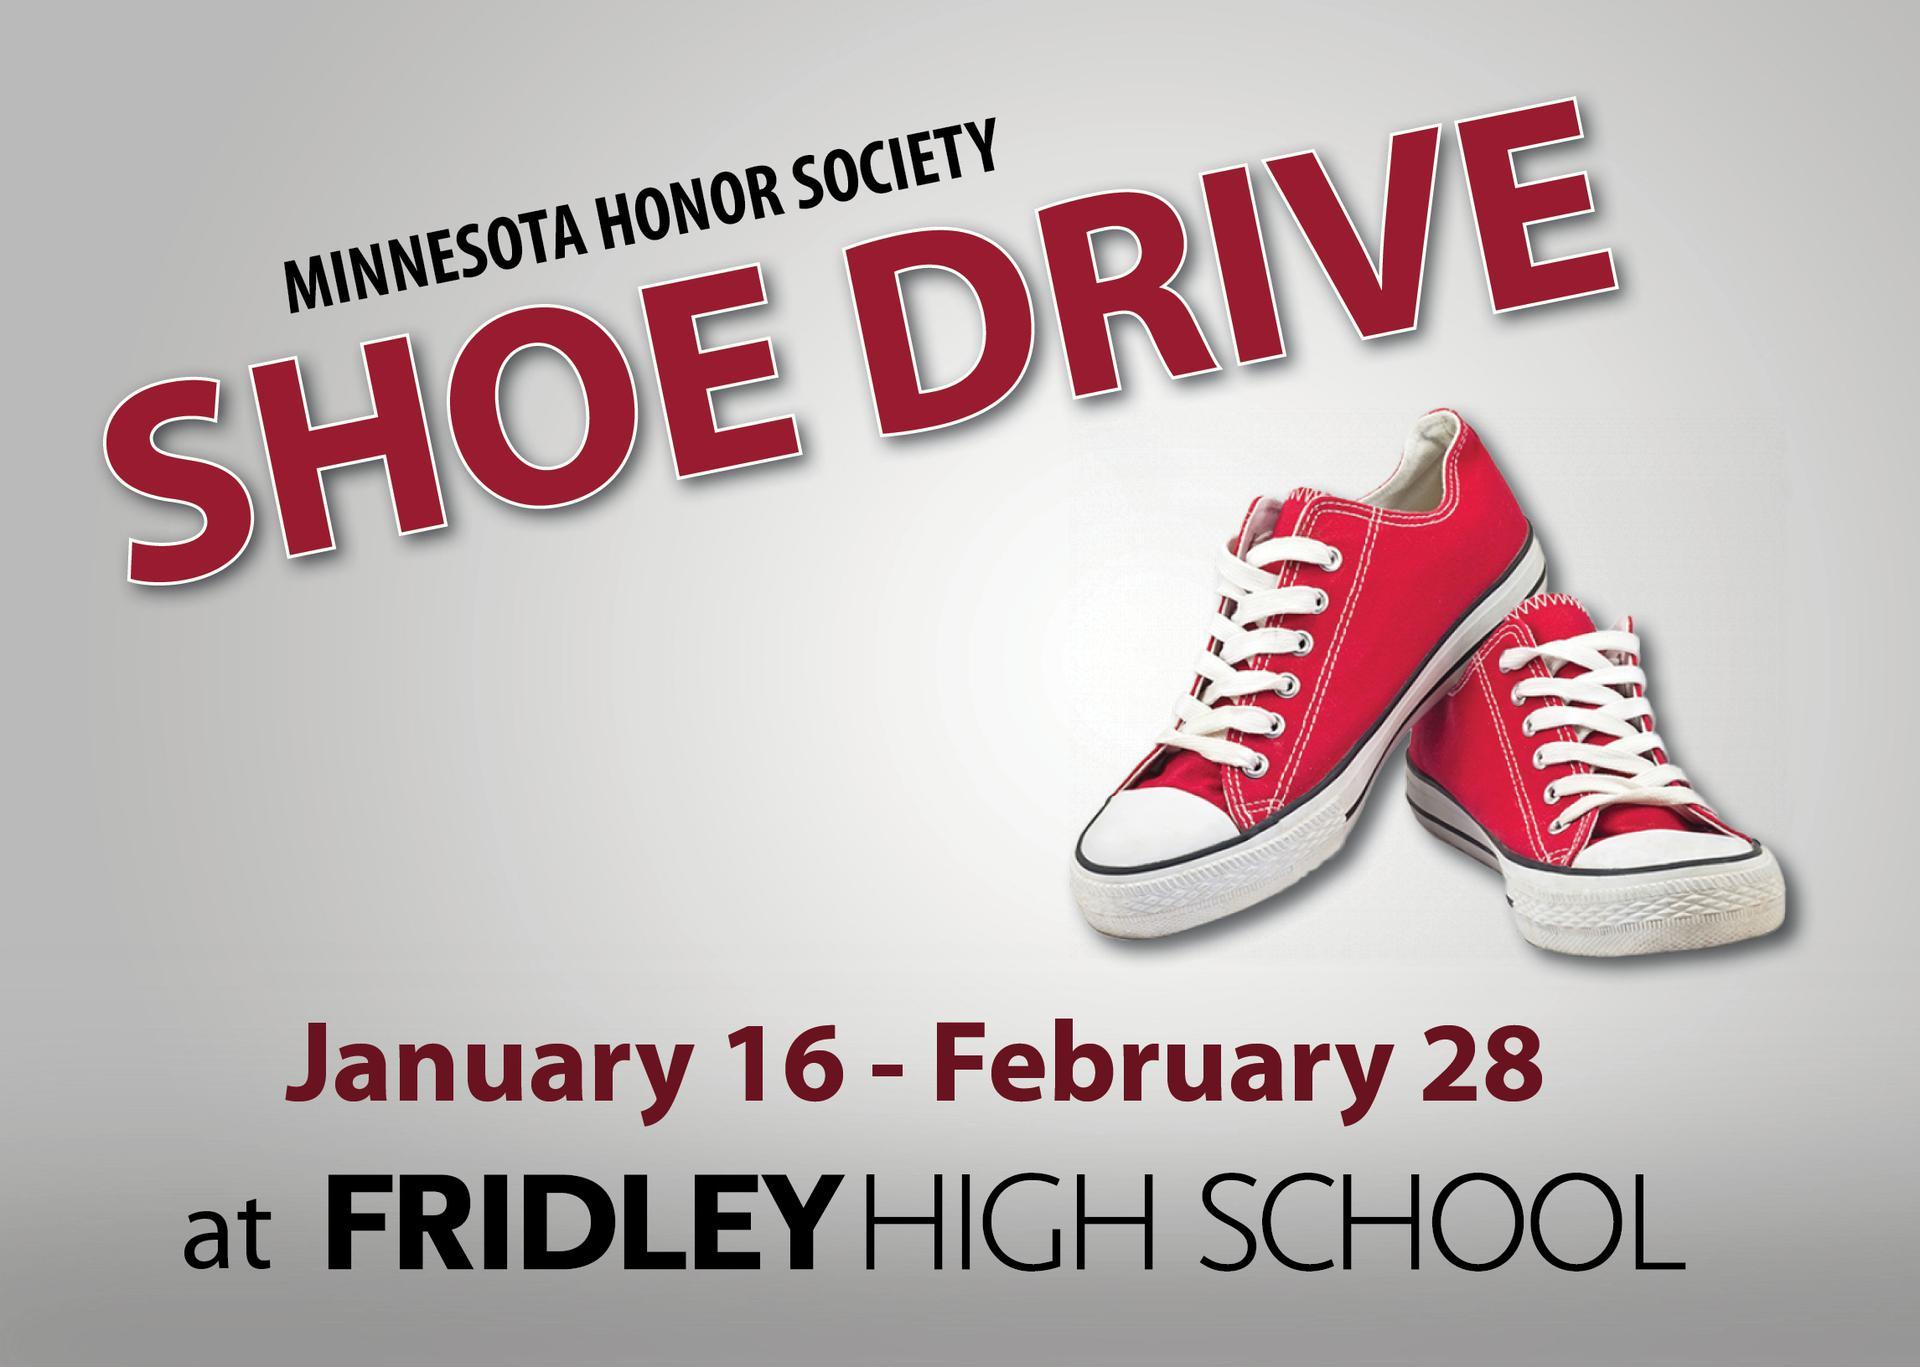 Fridley High School Shoe Drive